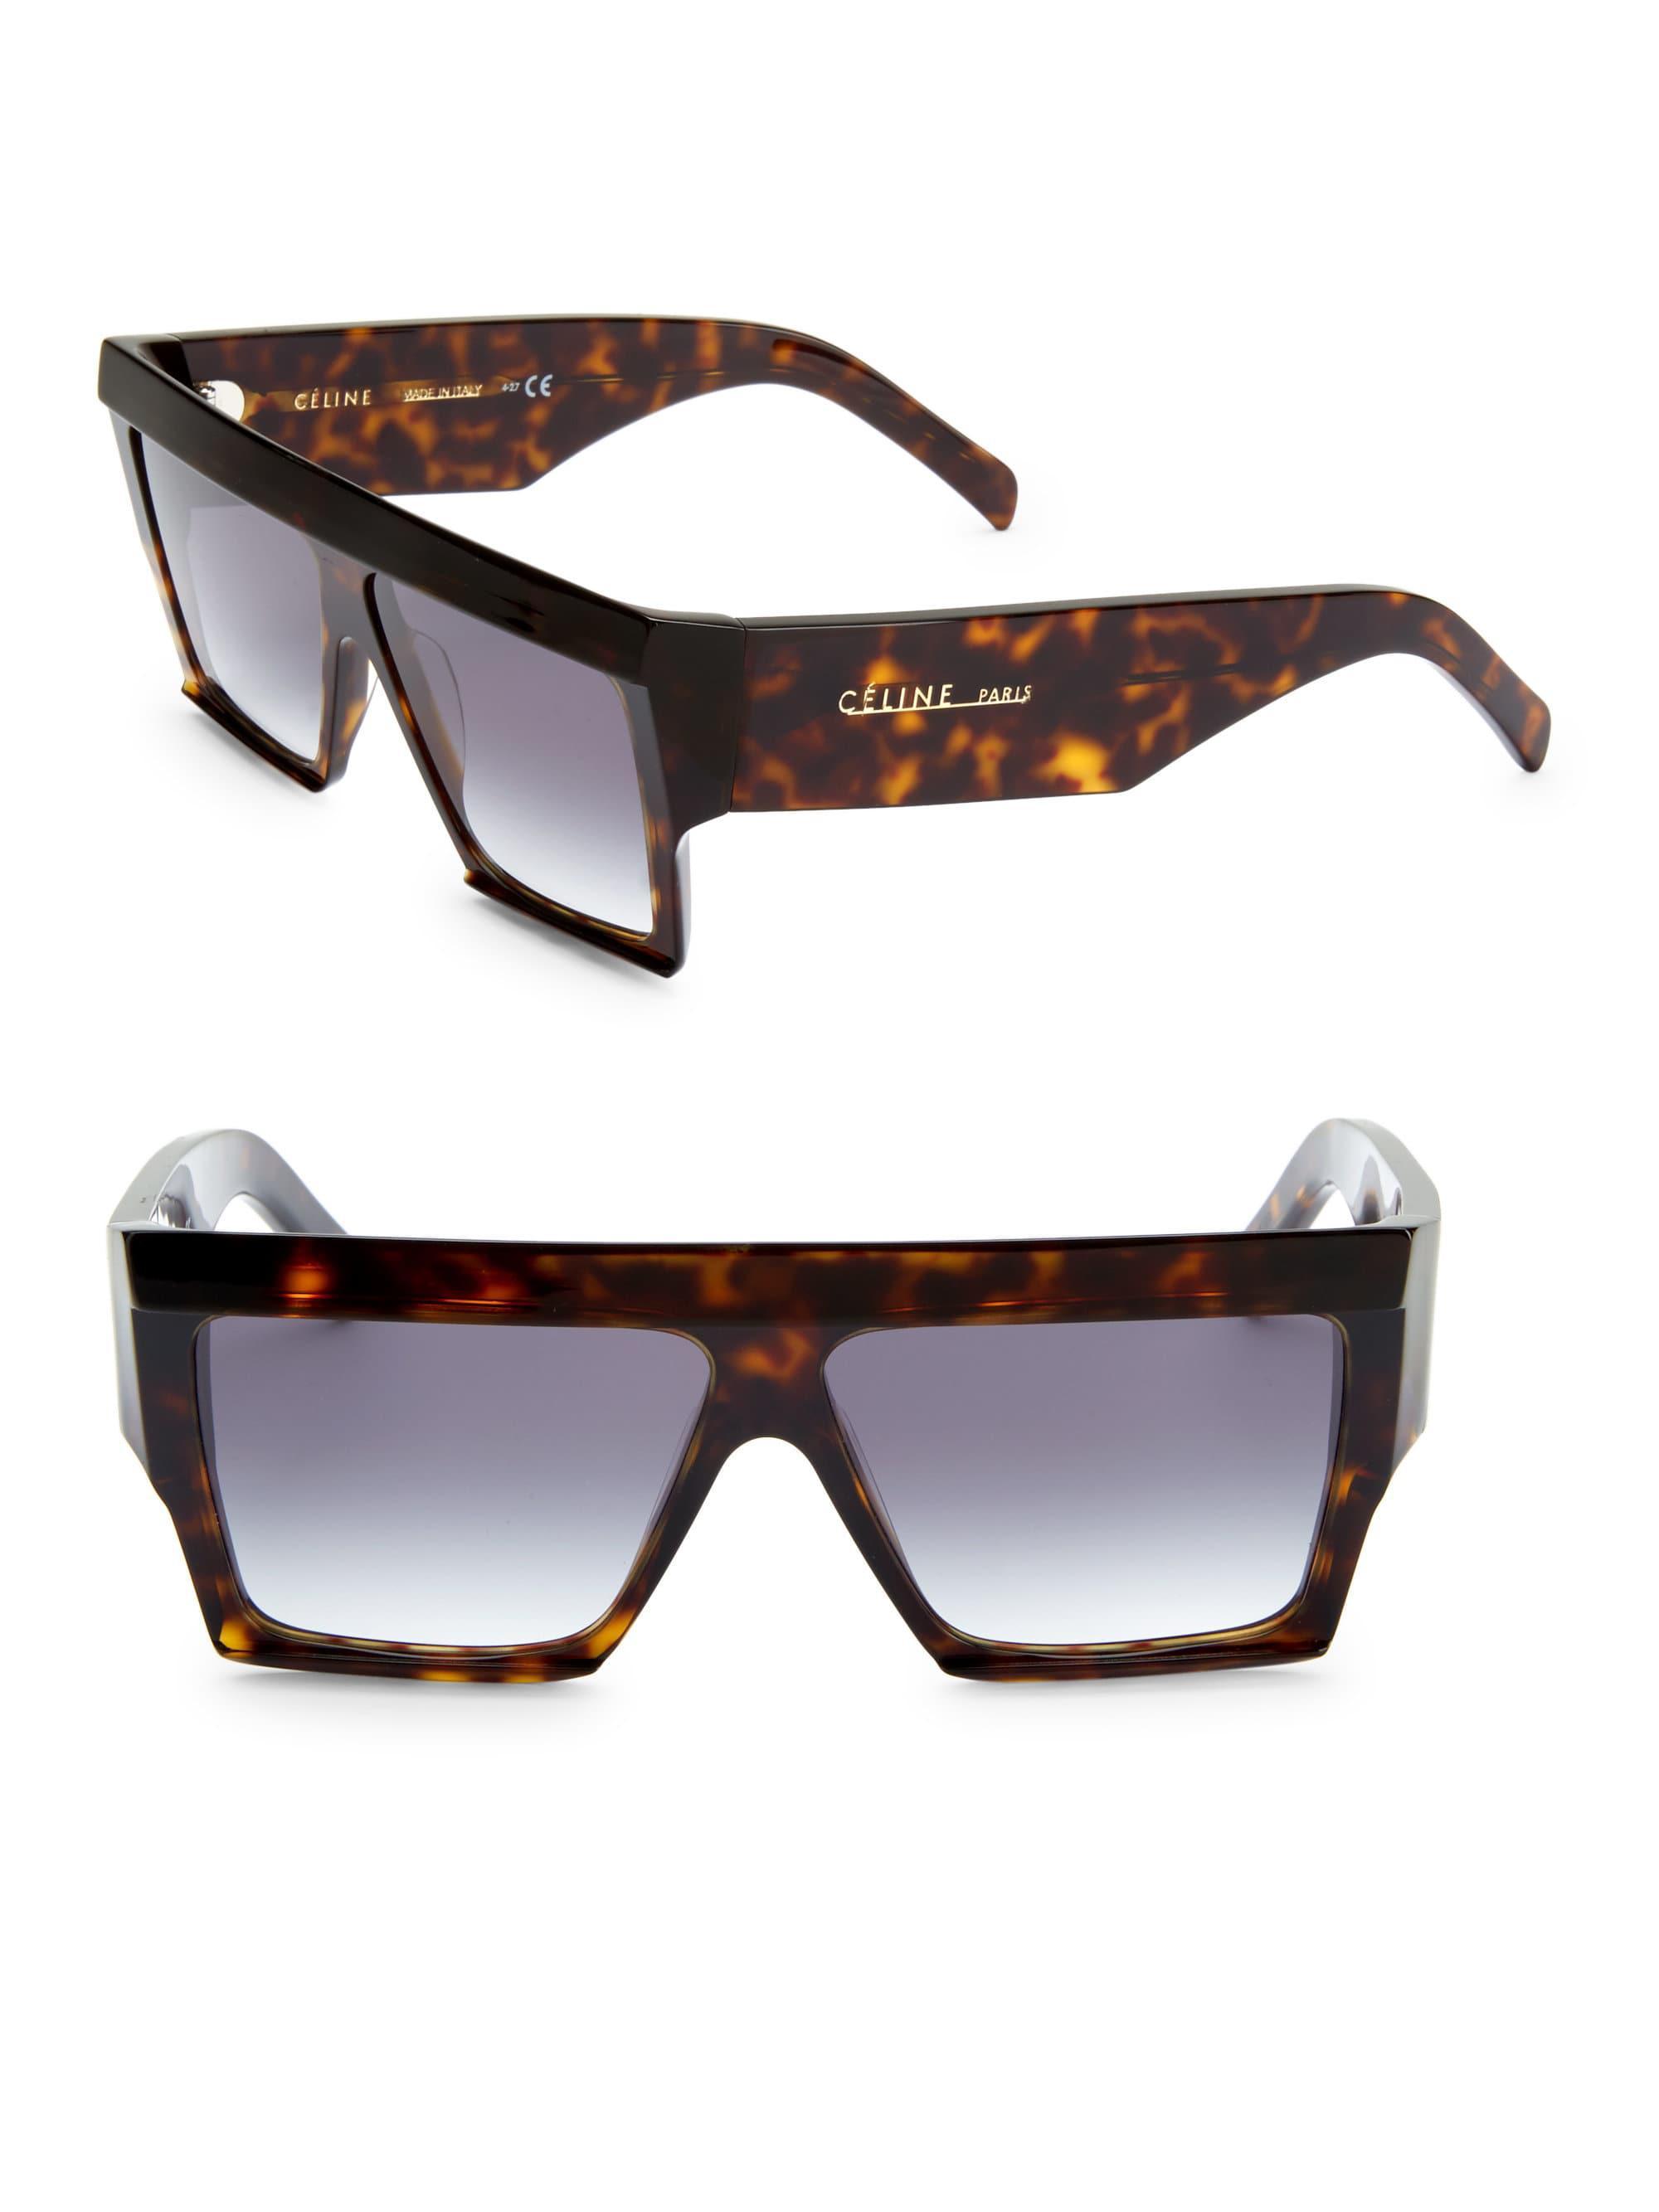 3ab500386273 Céline 60mm Tortoisue Square Sunglasses in Brown - Lyst